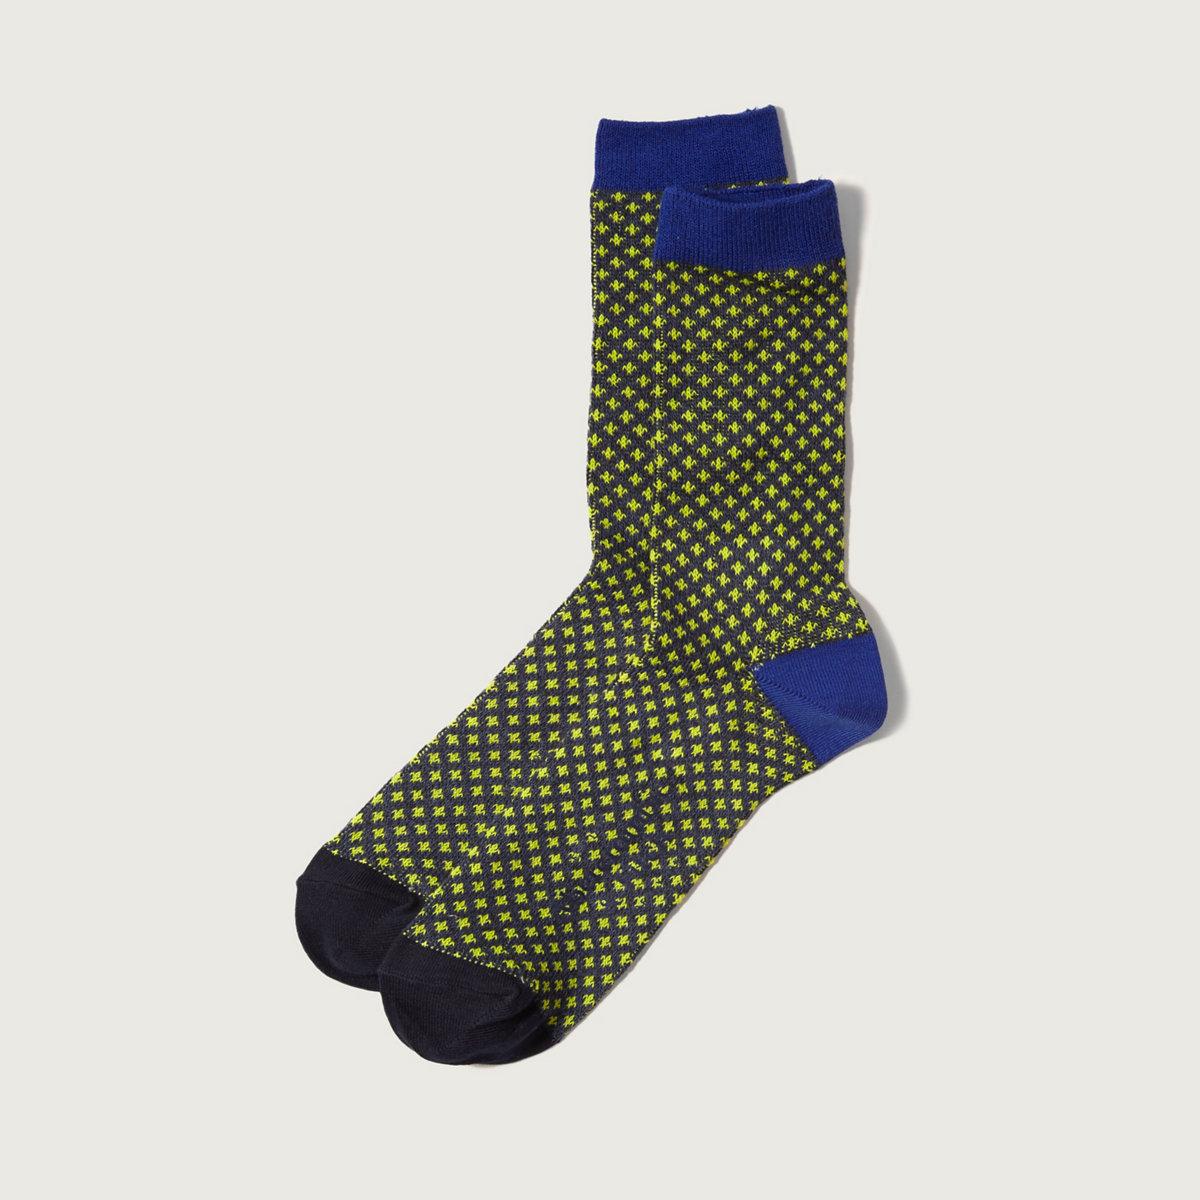 A&F Classic Socks